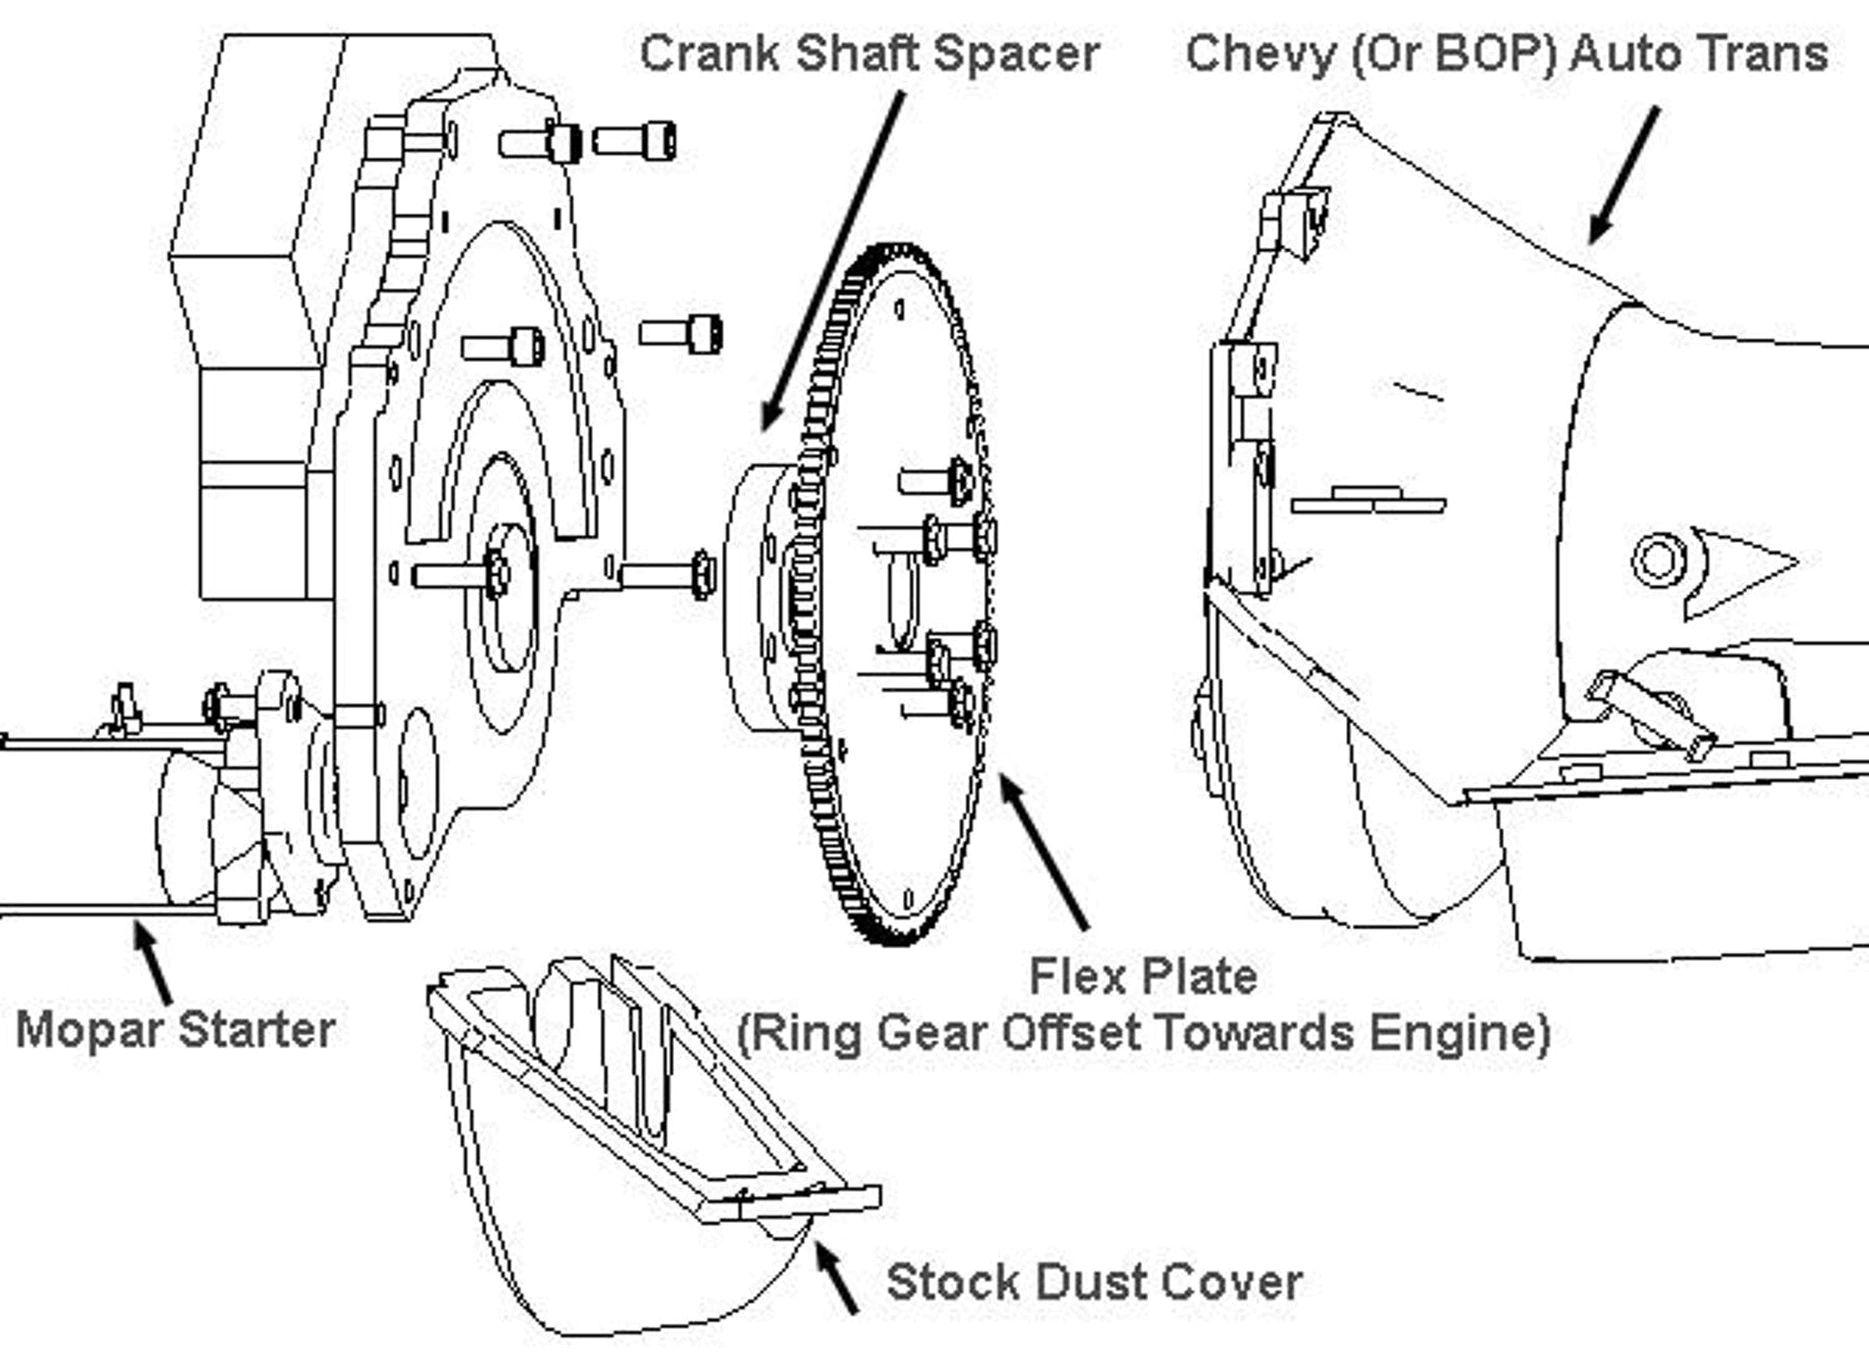 turbo 400 transmission wiring diagram